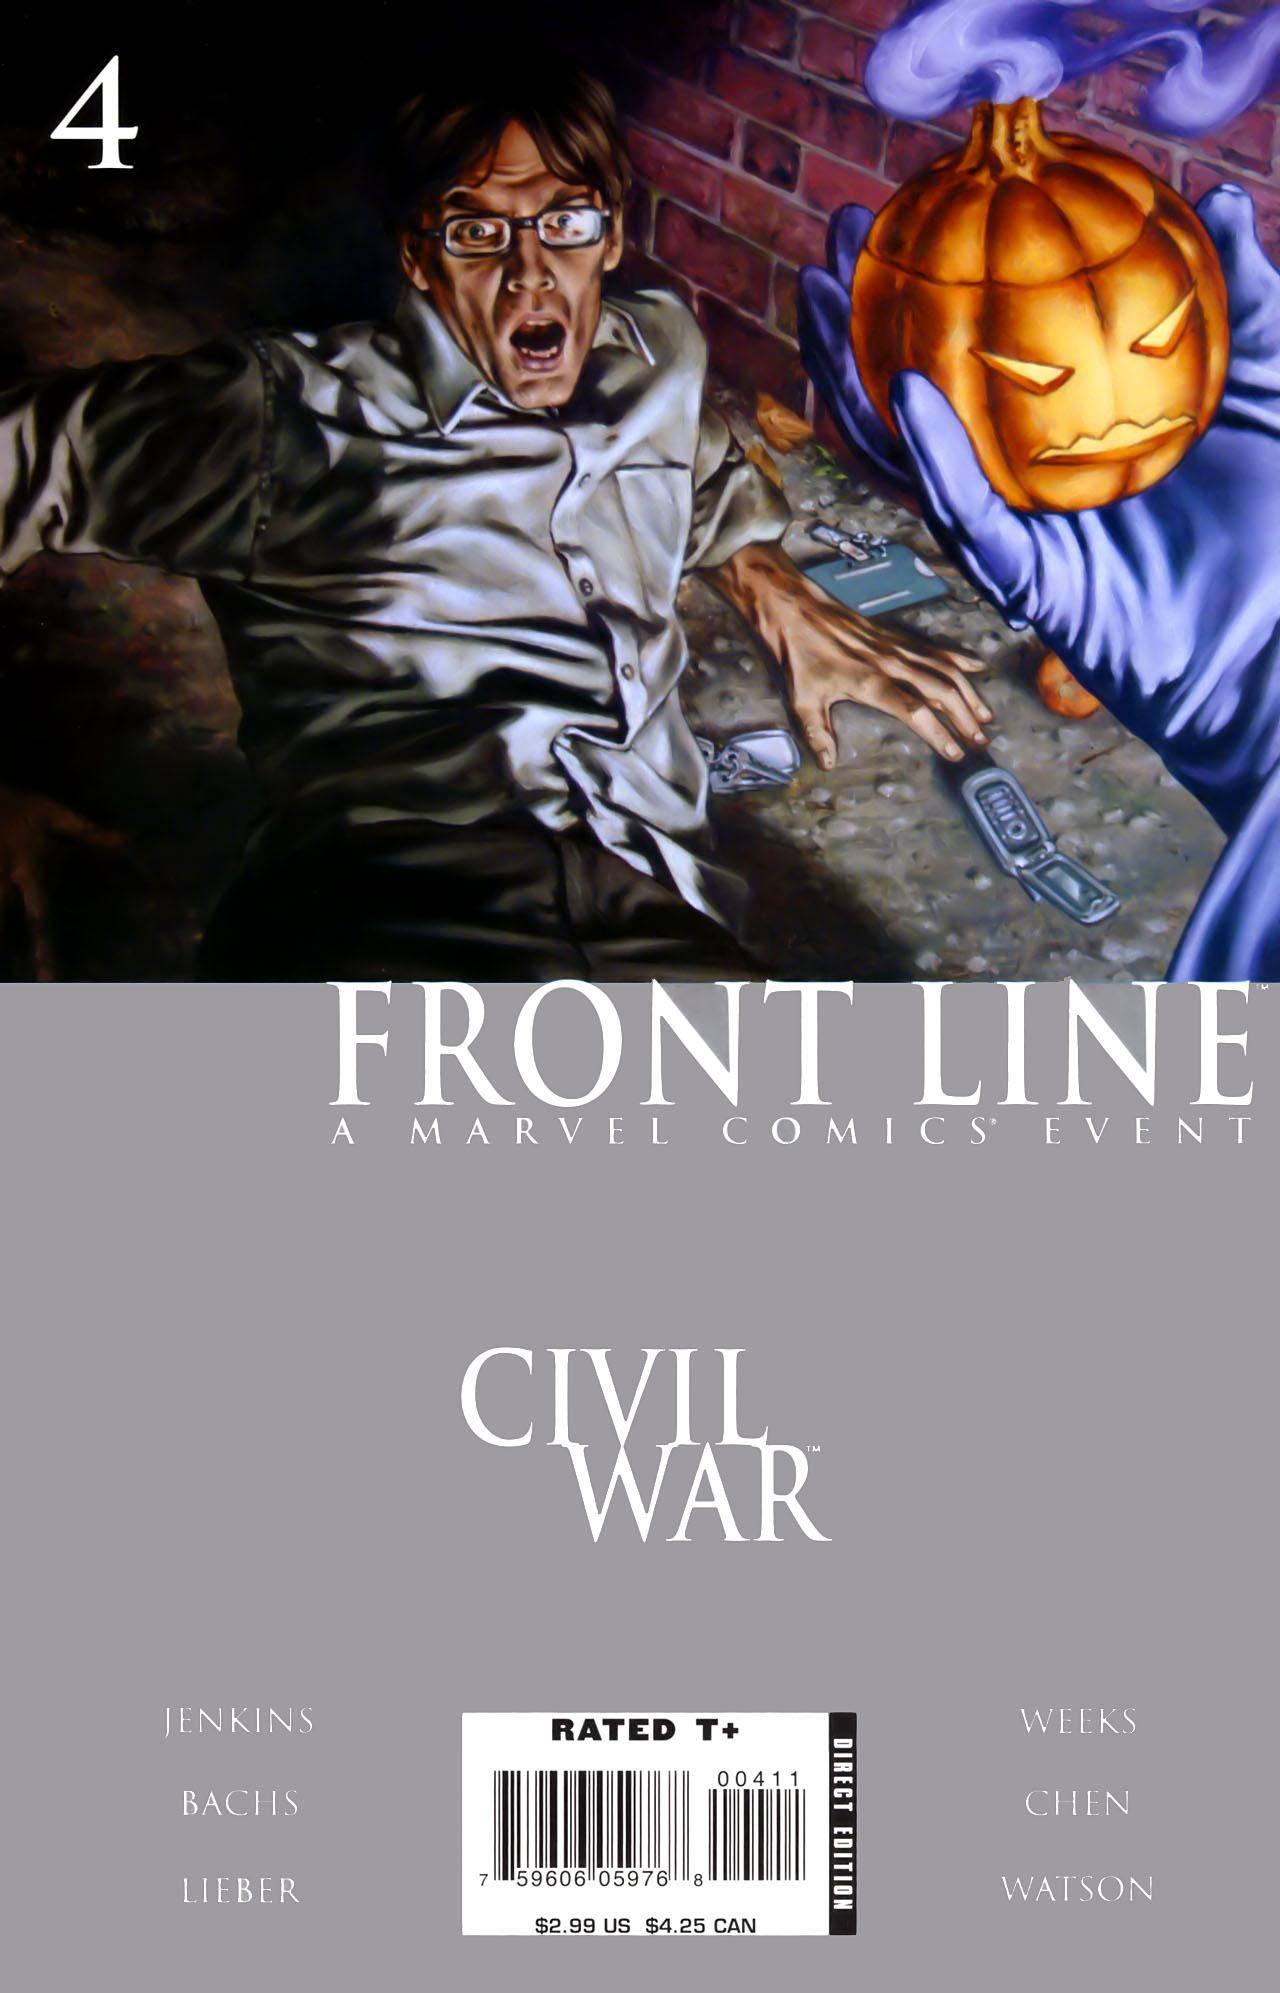 Civil War - Frontline 04